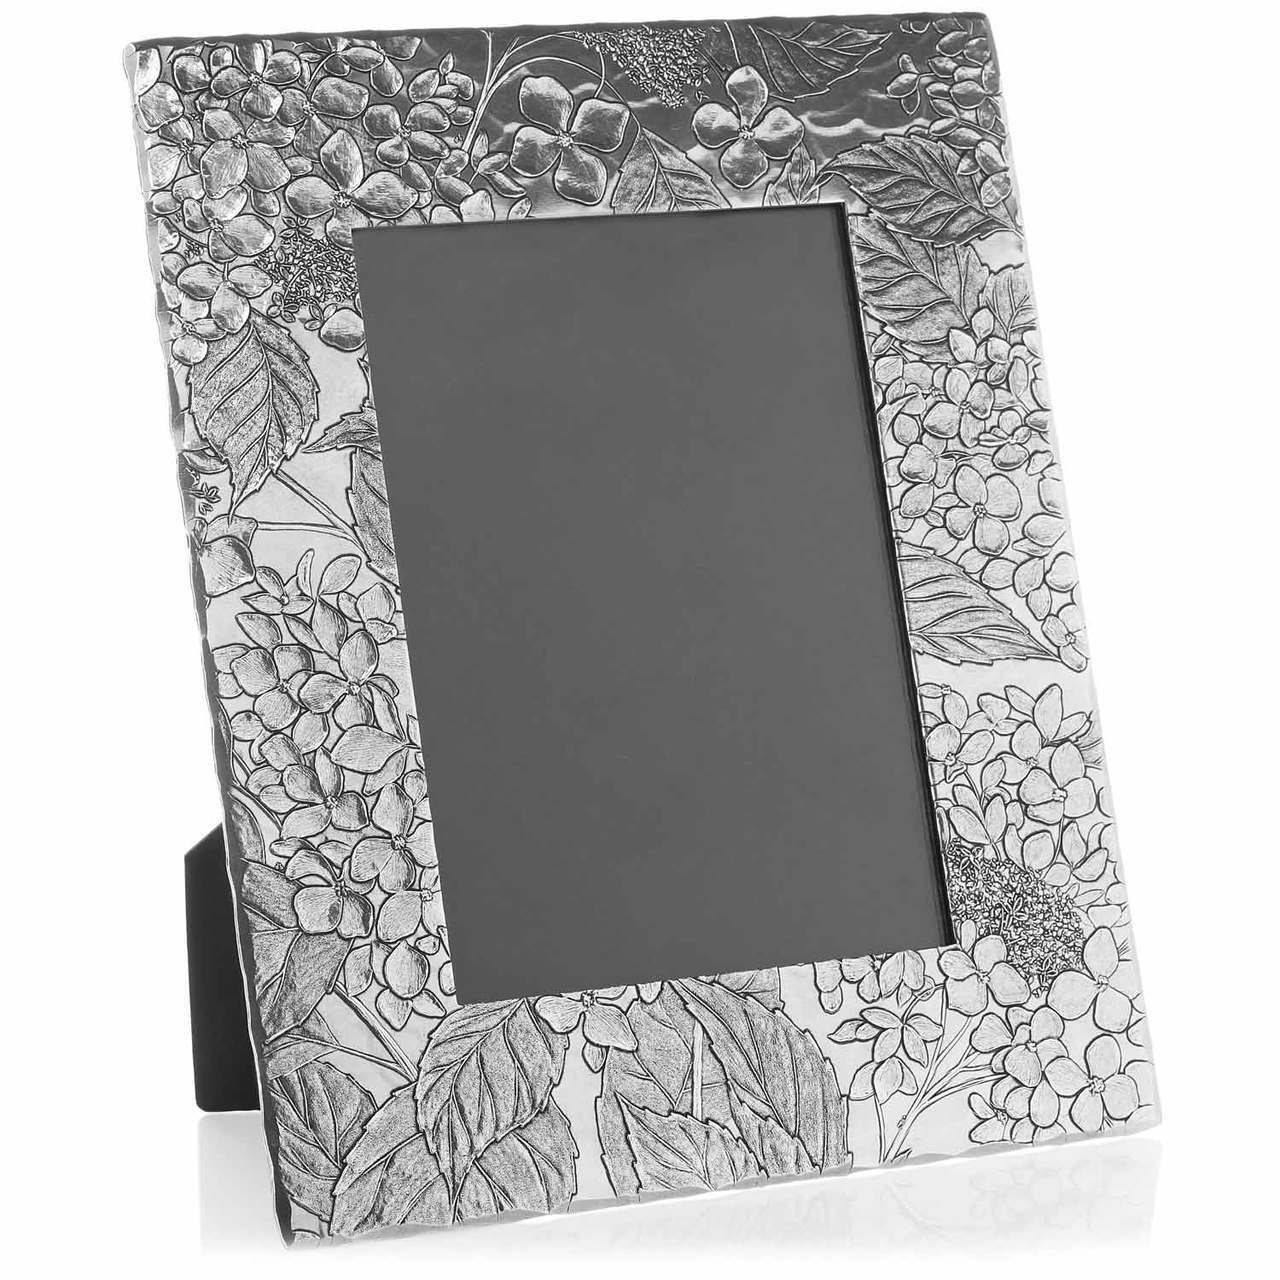 Hydrangea 5 x 7 Frame - Wendell August Forge